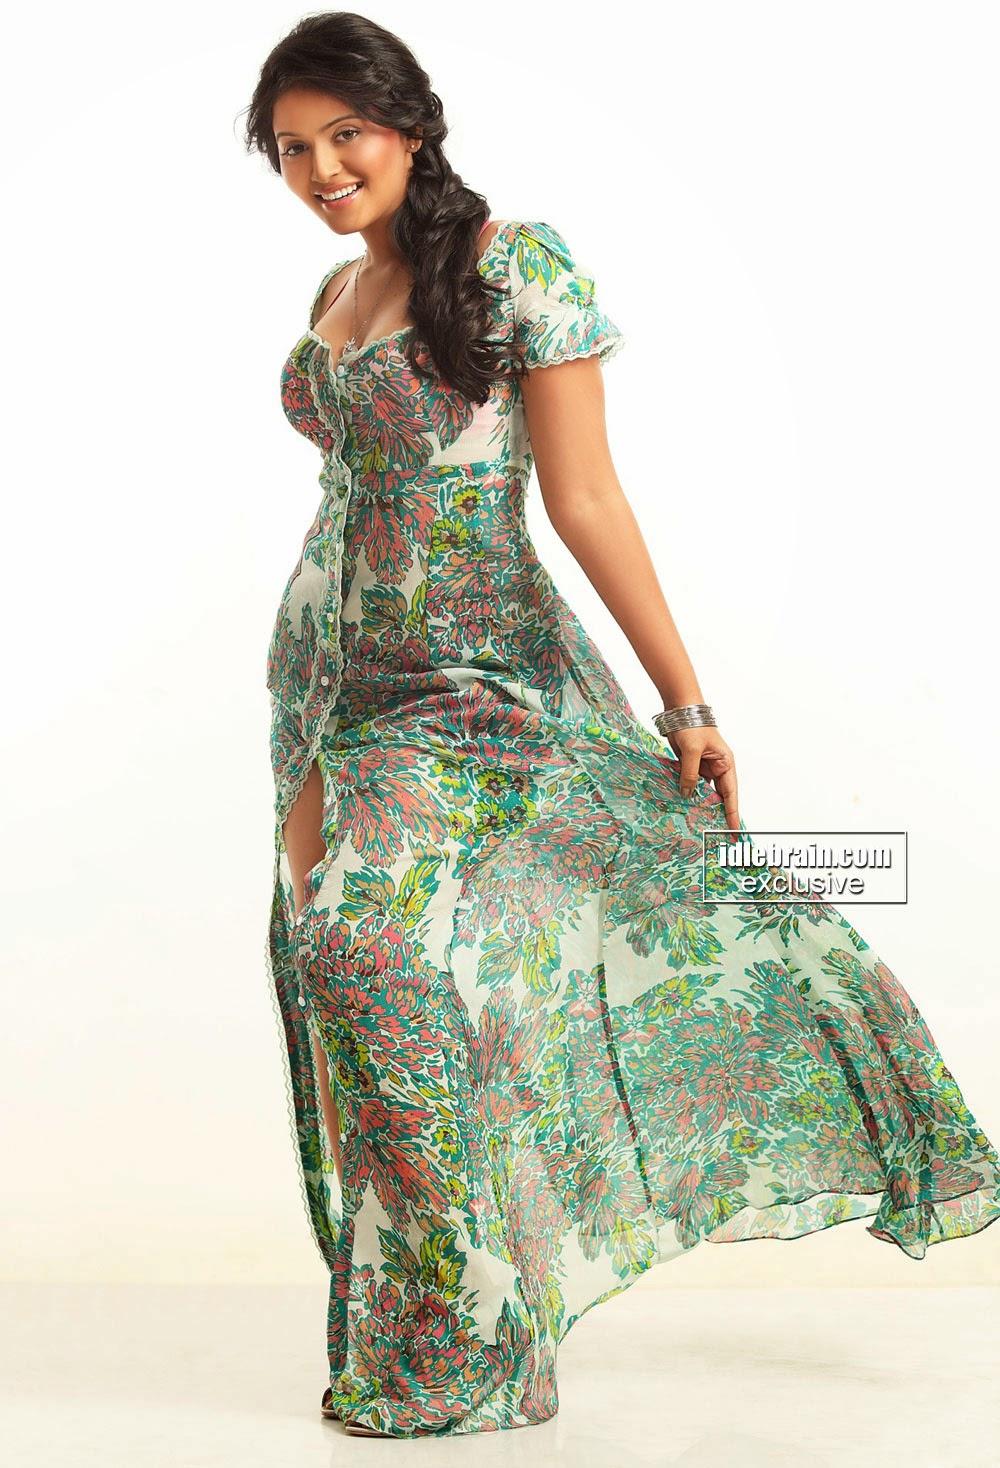 Anjali hot dress